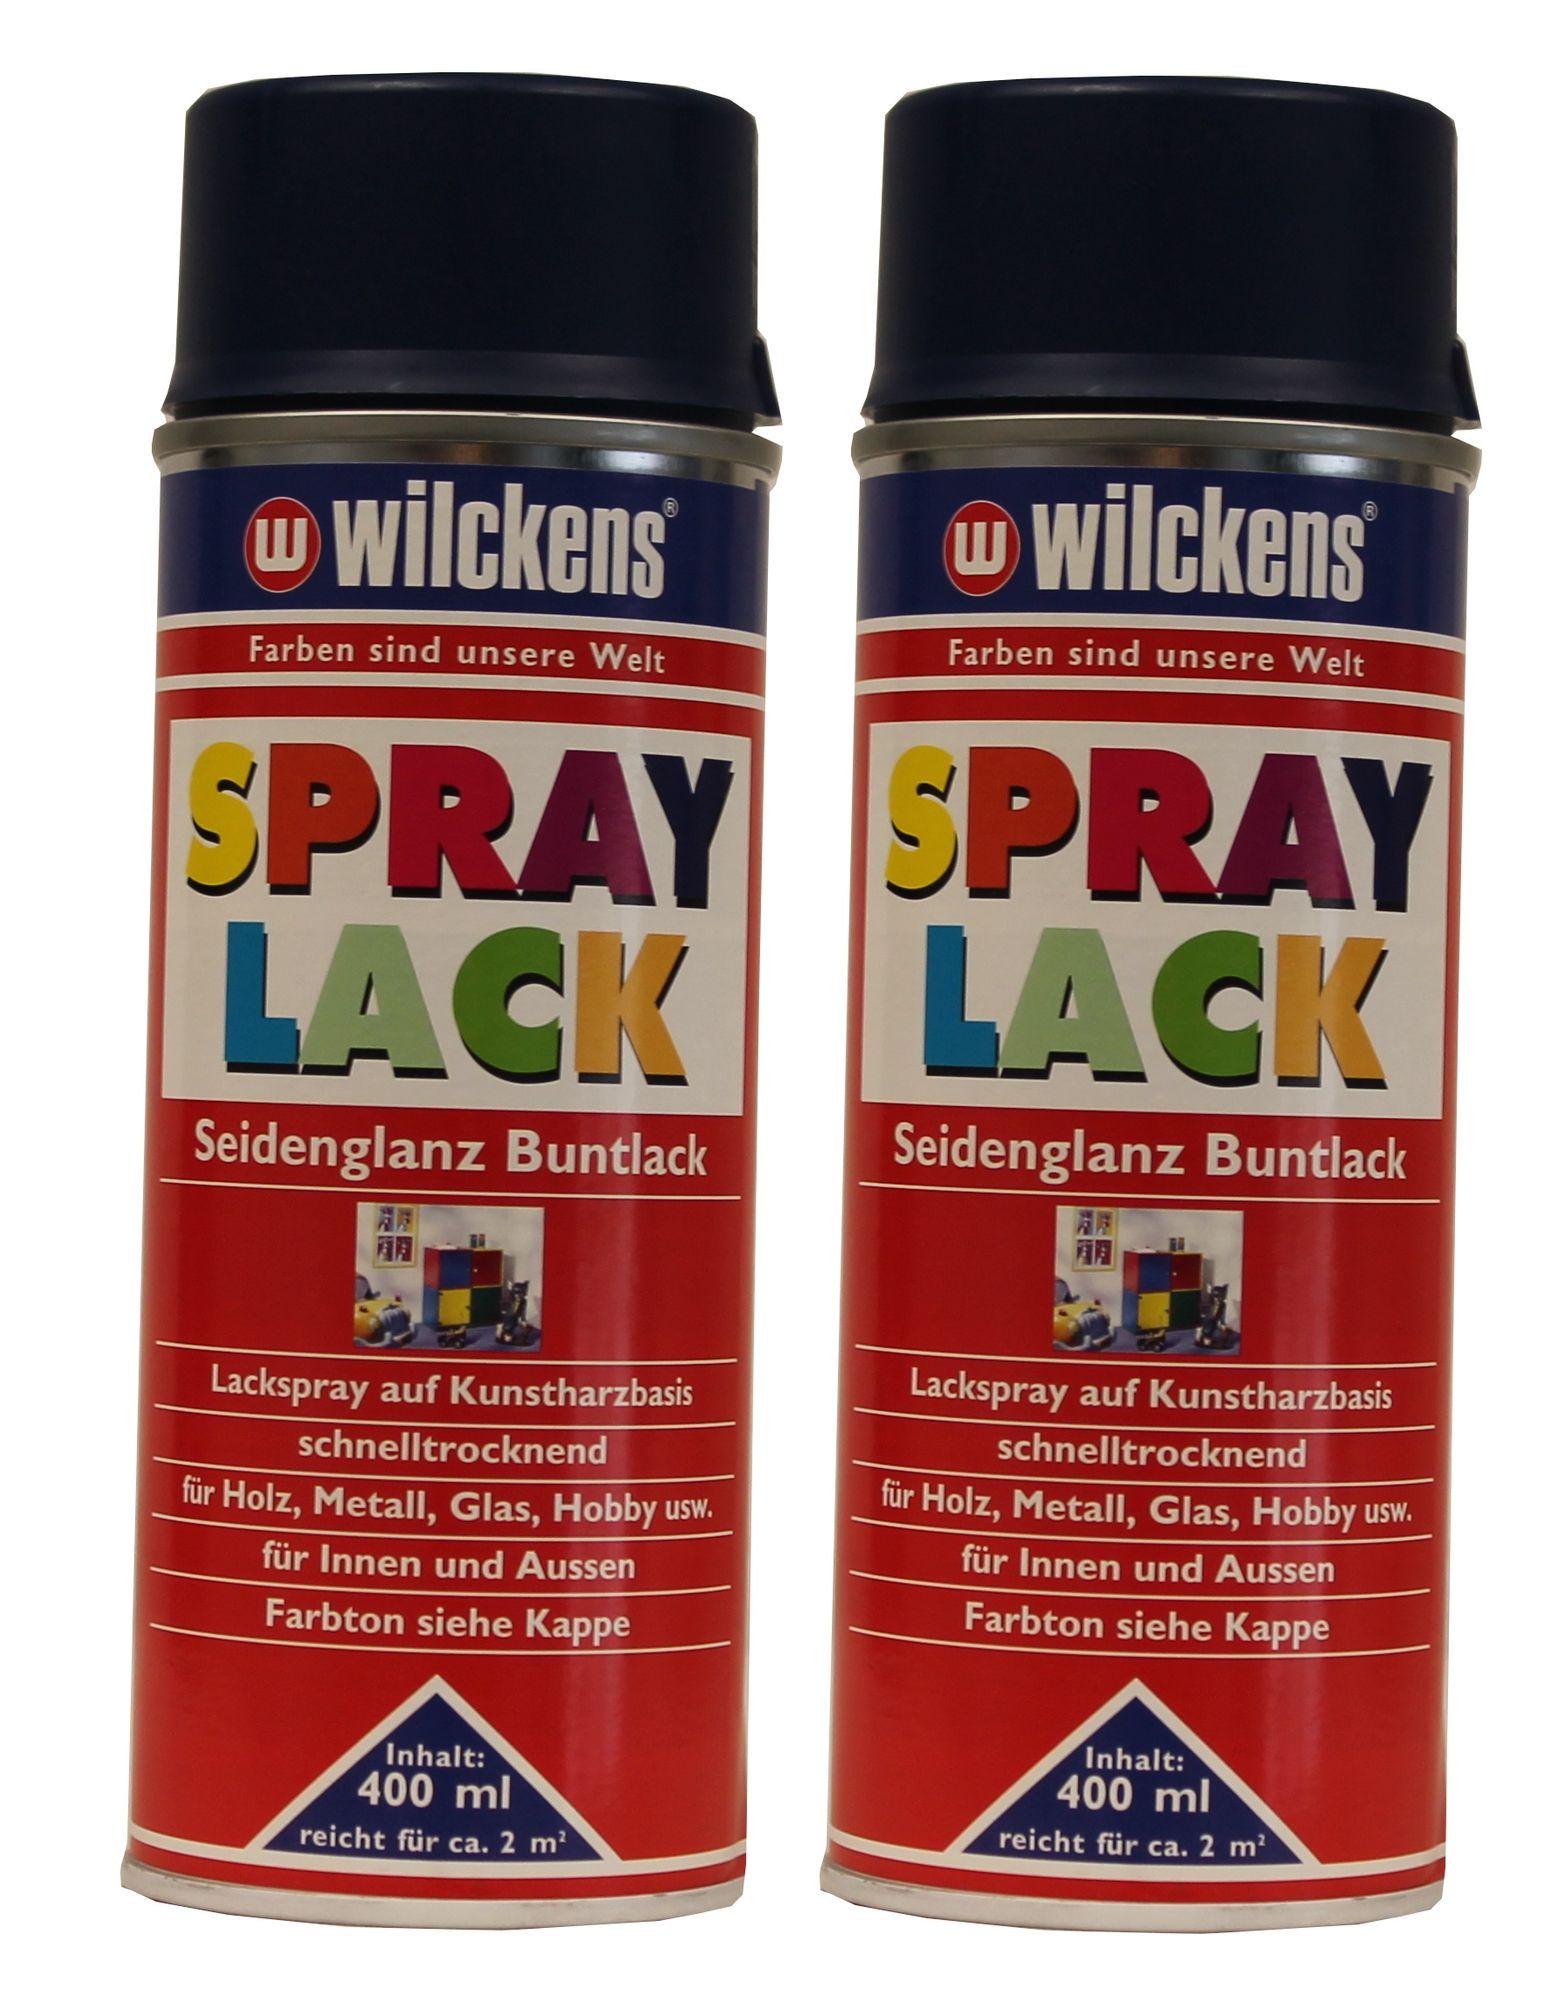 2 x Wilckens Spraylack Seidenglanz Buntlack 400ml